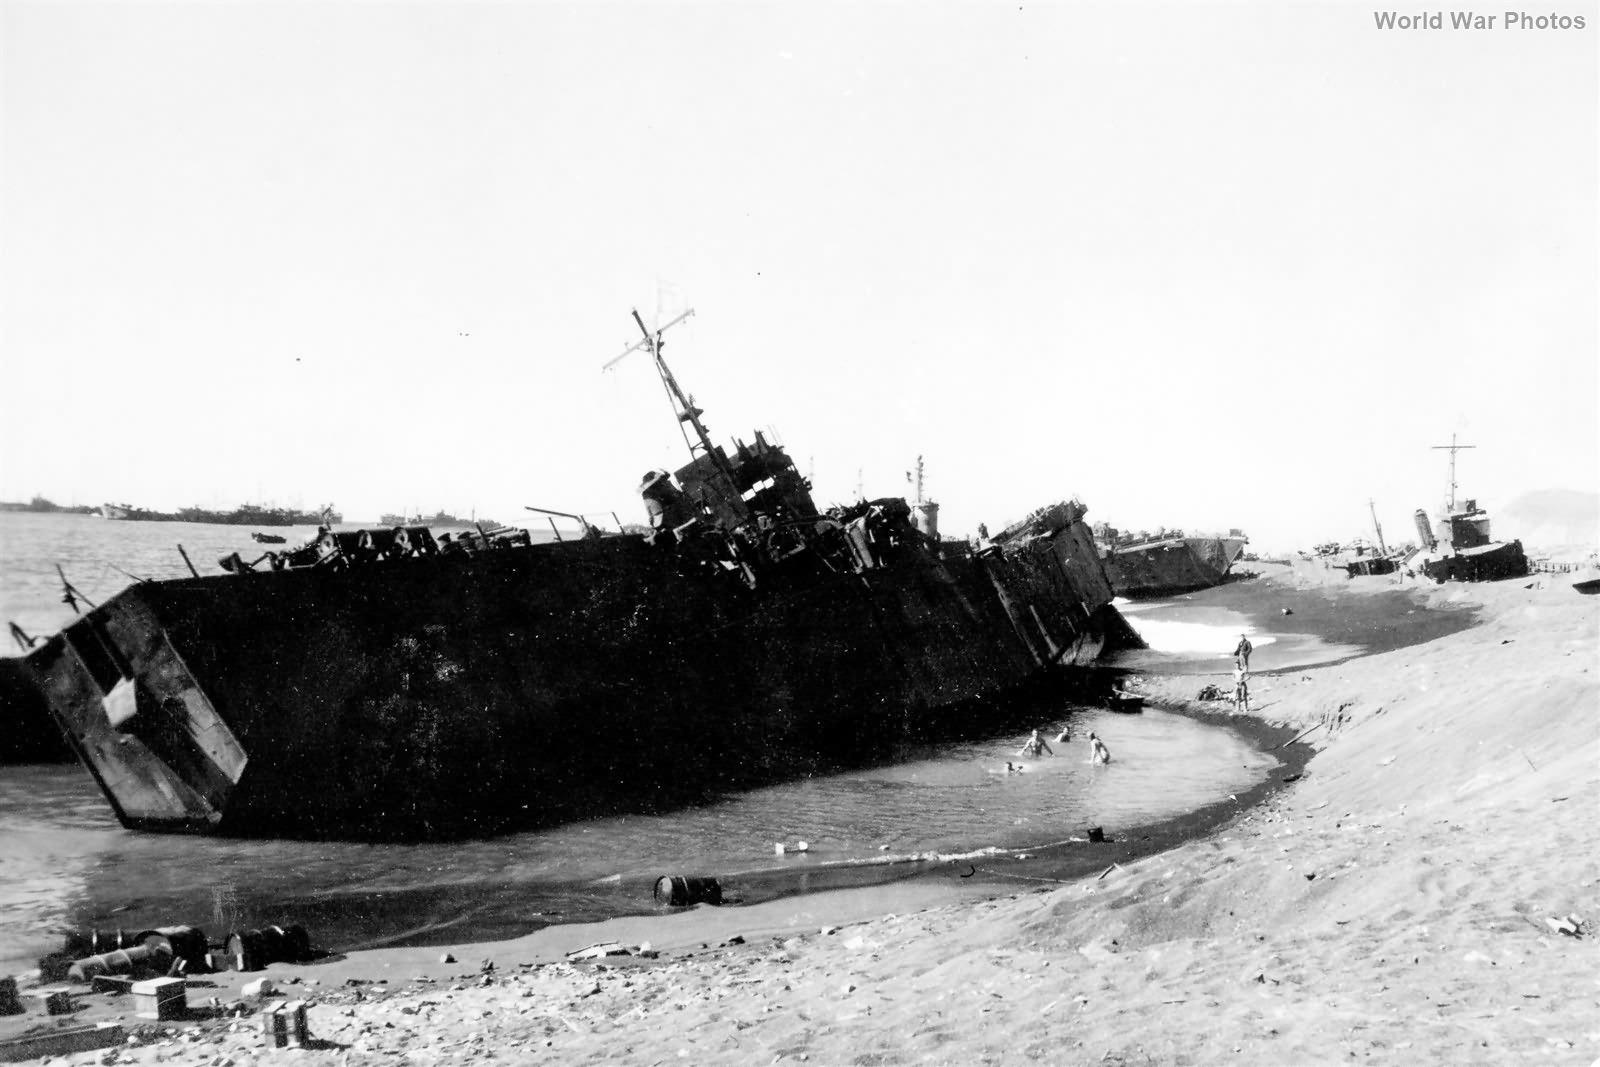 Japanese Type 101 Landing Ship wrecked on Iwo Jima Beach